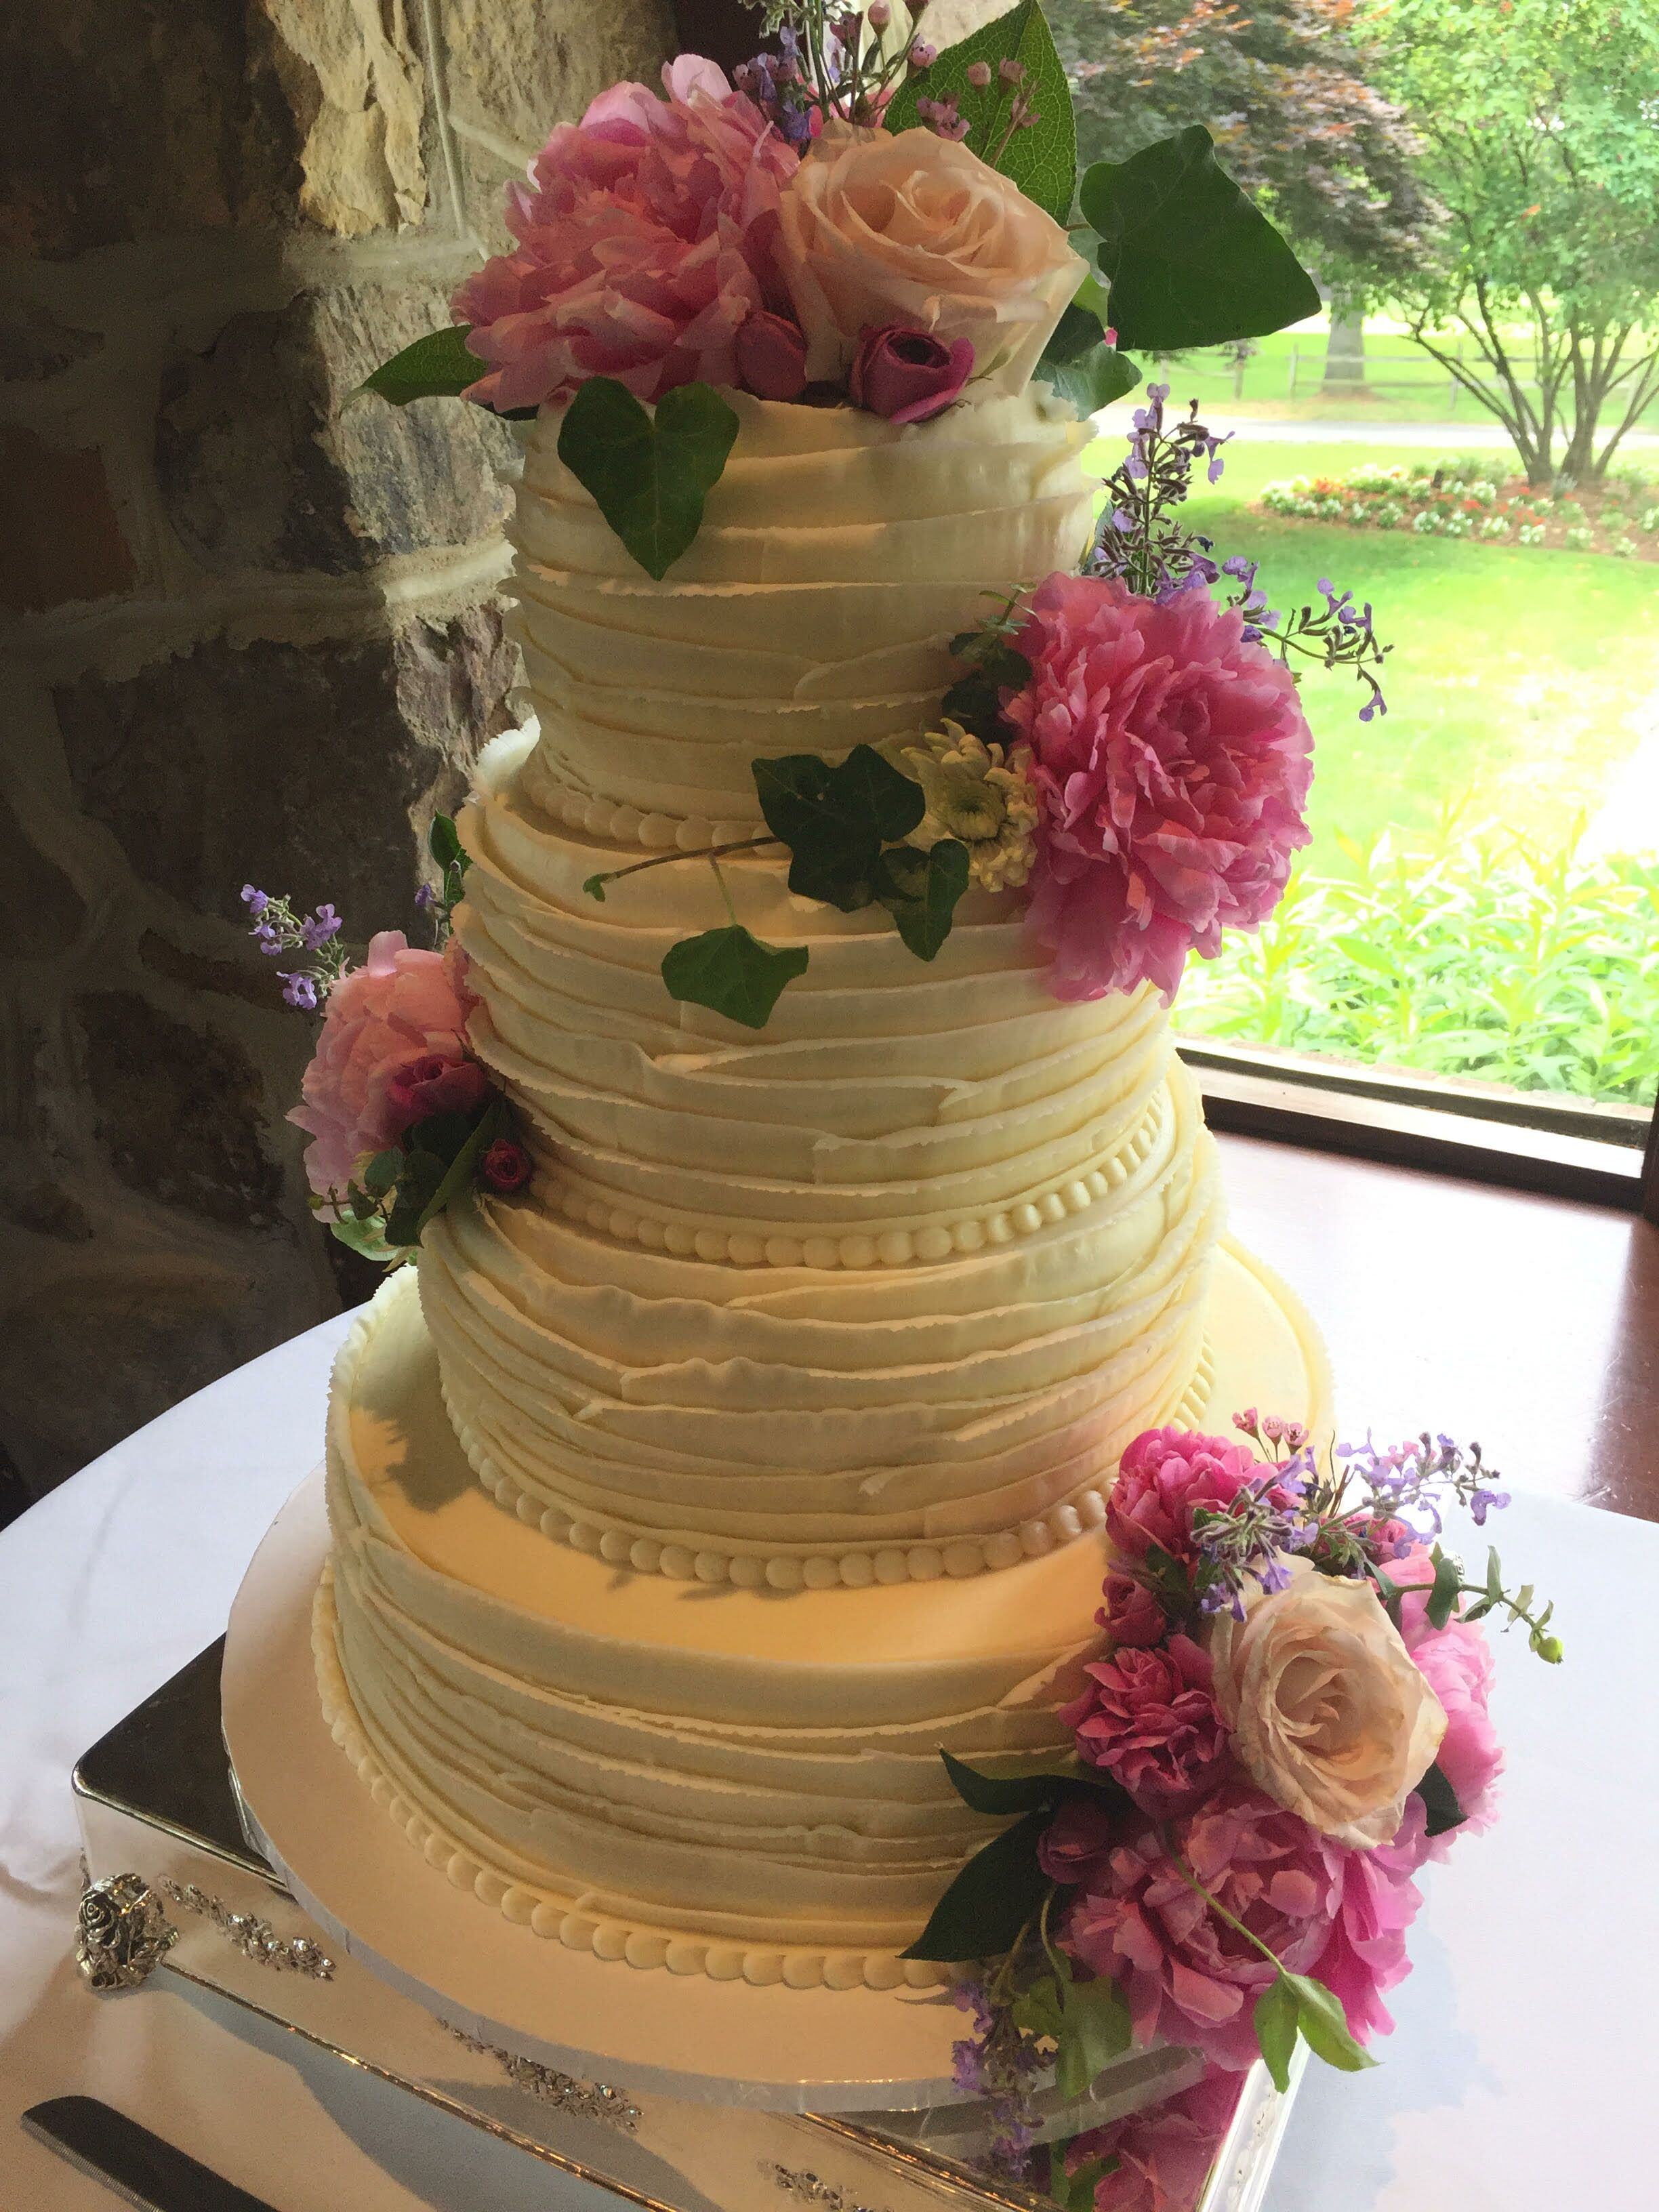 Sophisti Cakes Bakery Wedding Cakes Drexel Hill Pa